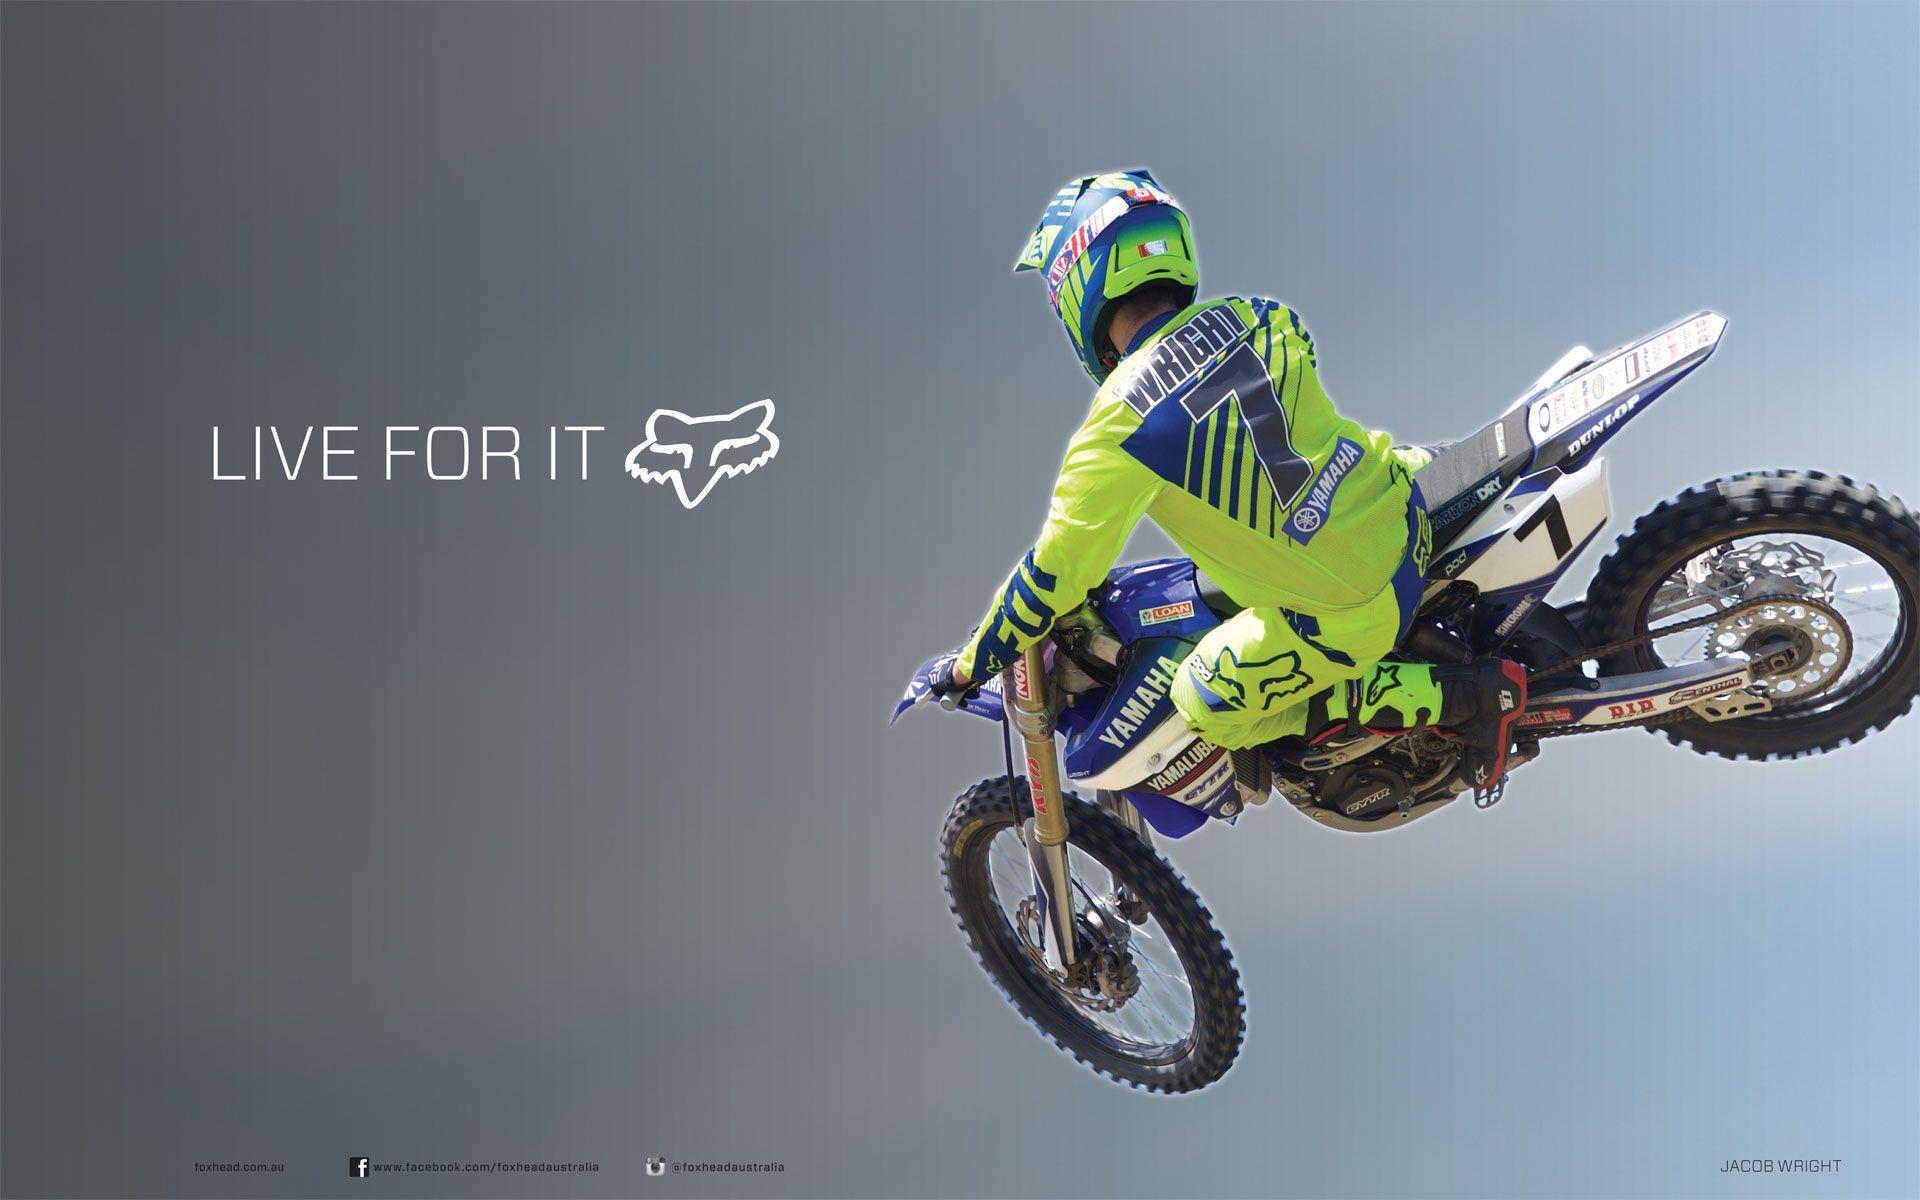 Fox Motocross Wallpapers Top Free Fox Motocross Backgrounds Wallpaperaccess